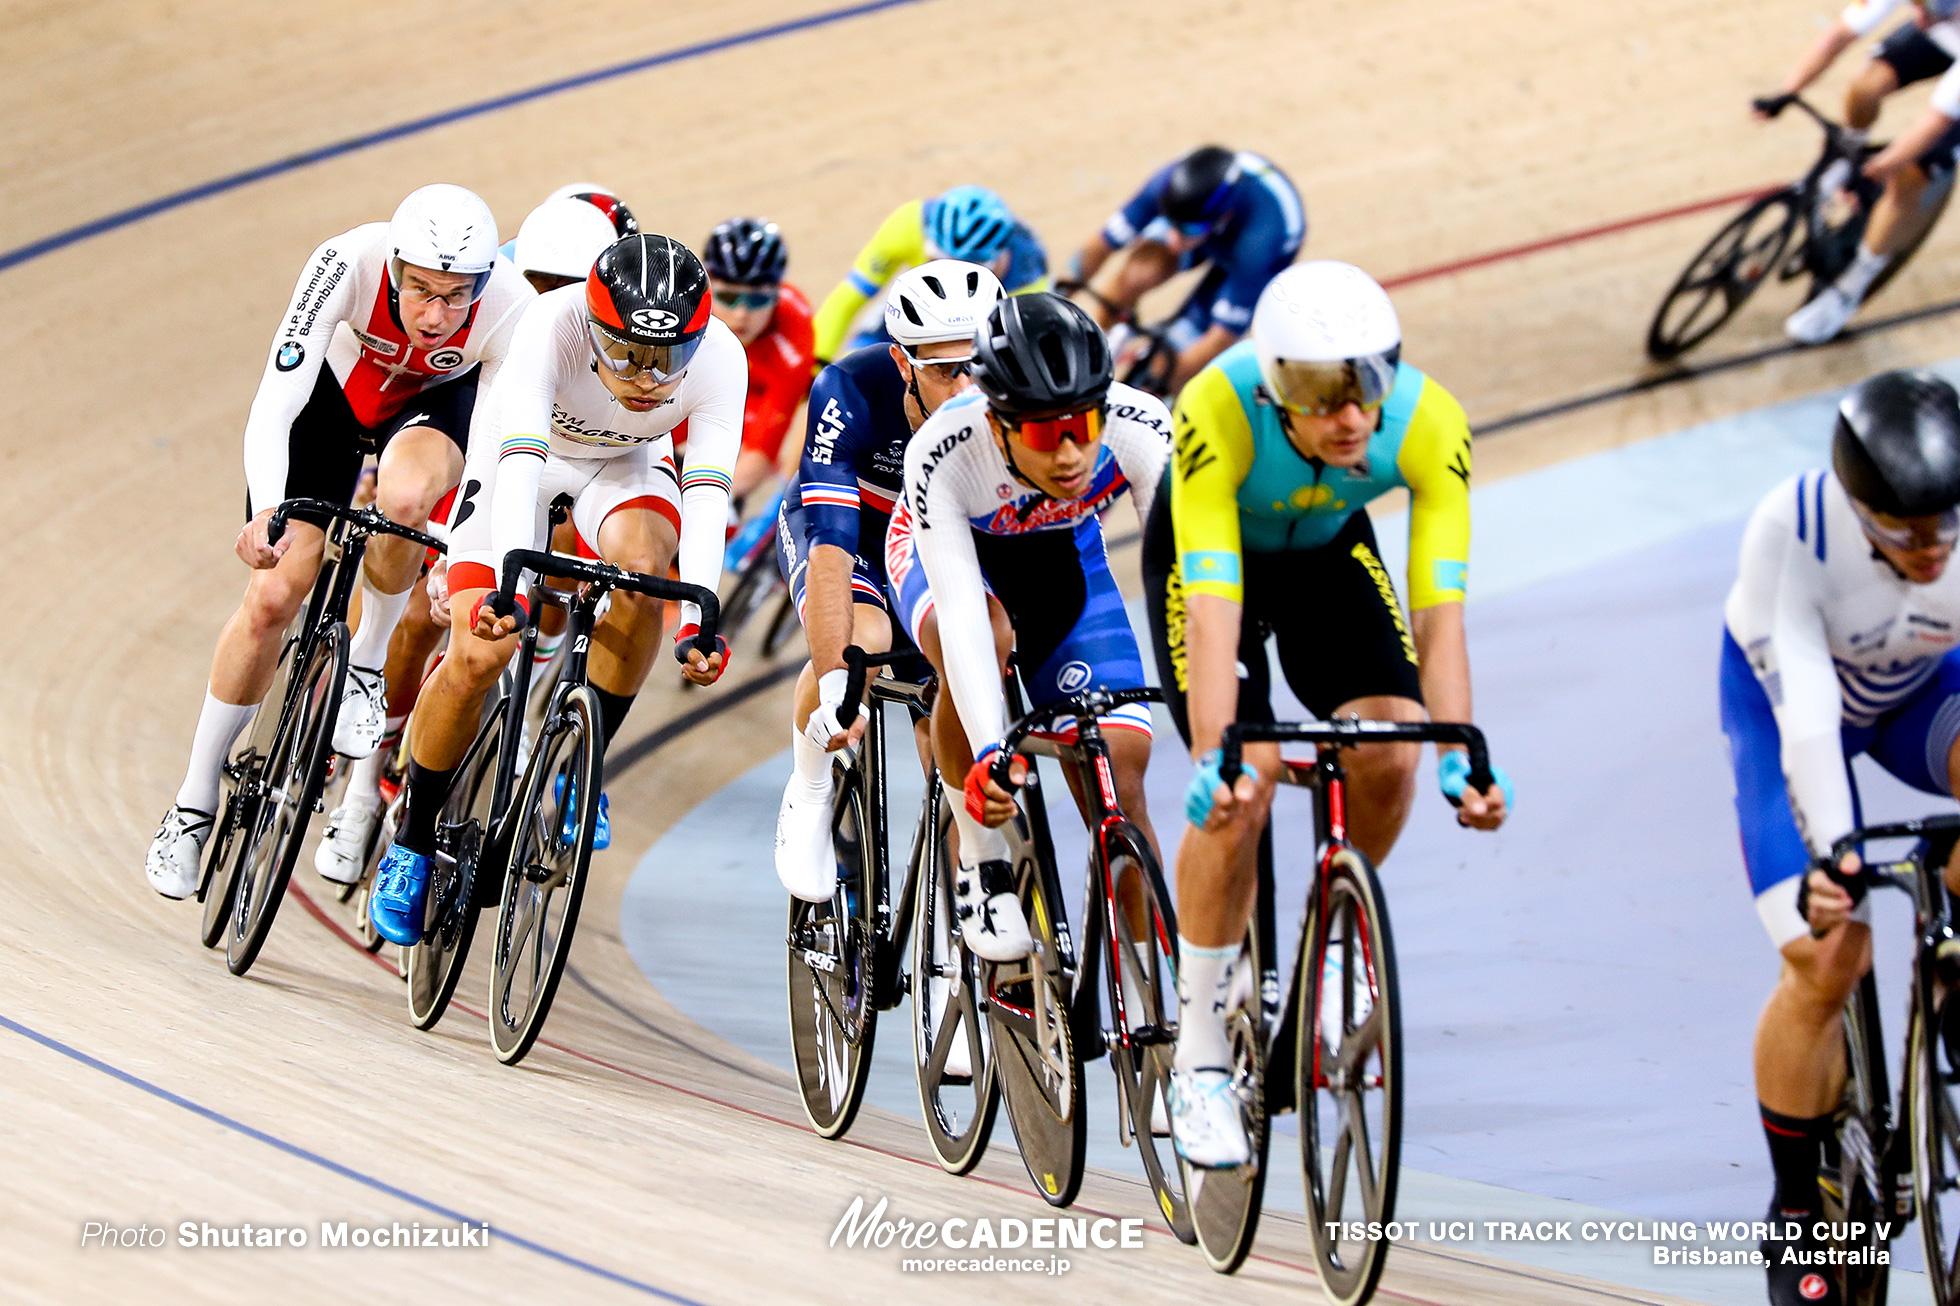 Men's Omnium / Scratch Race / TISSOT UCI TRACK CYCLING WORLD CUP V, Brisbane, Australia